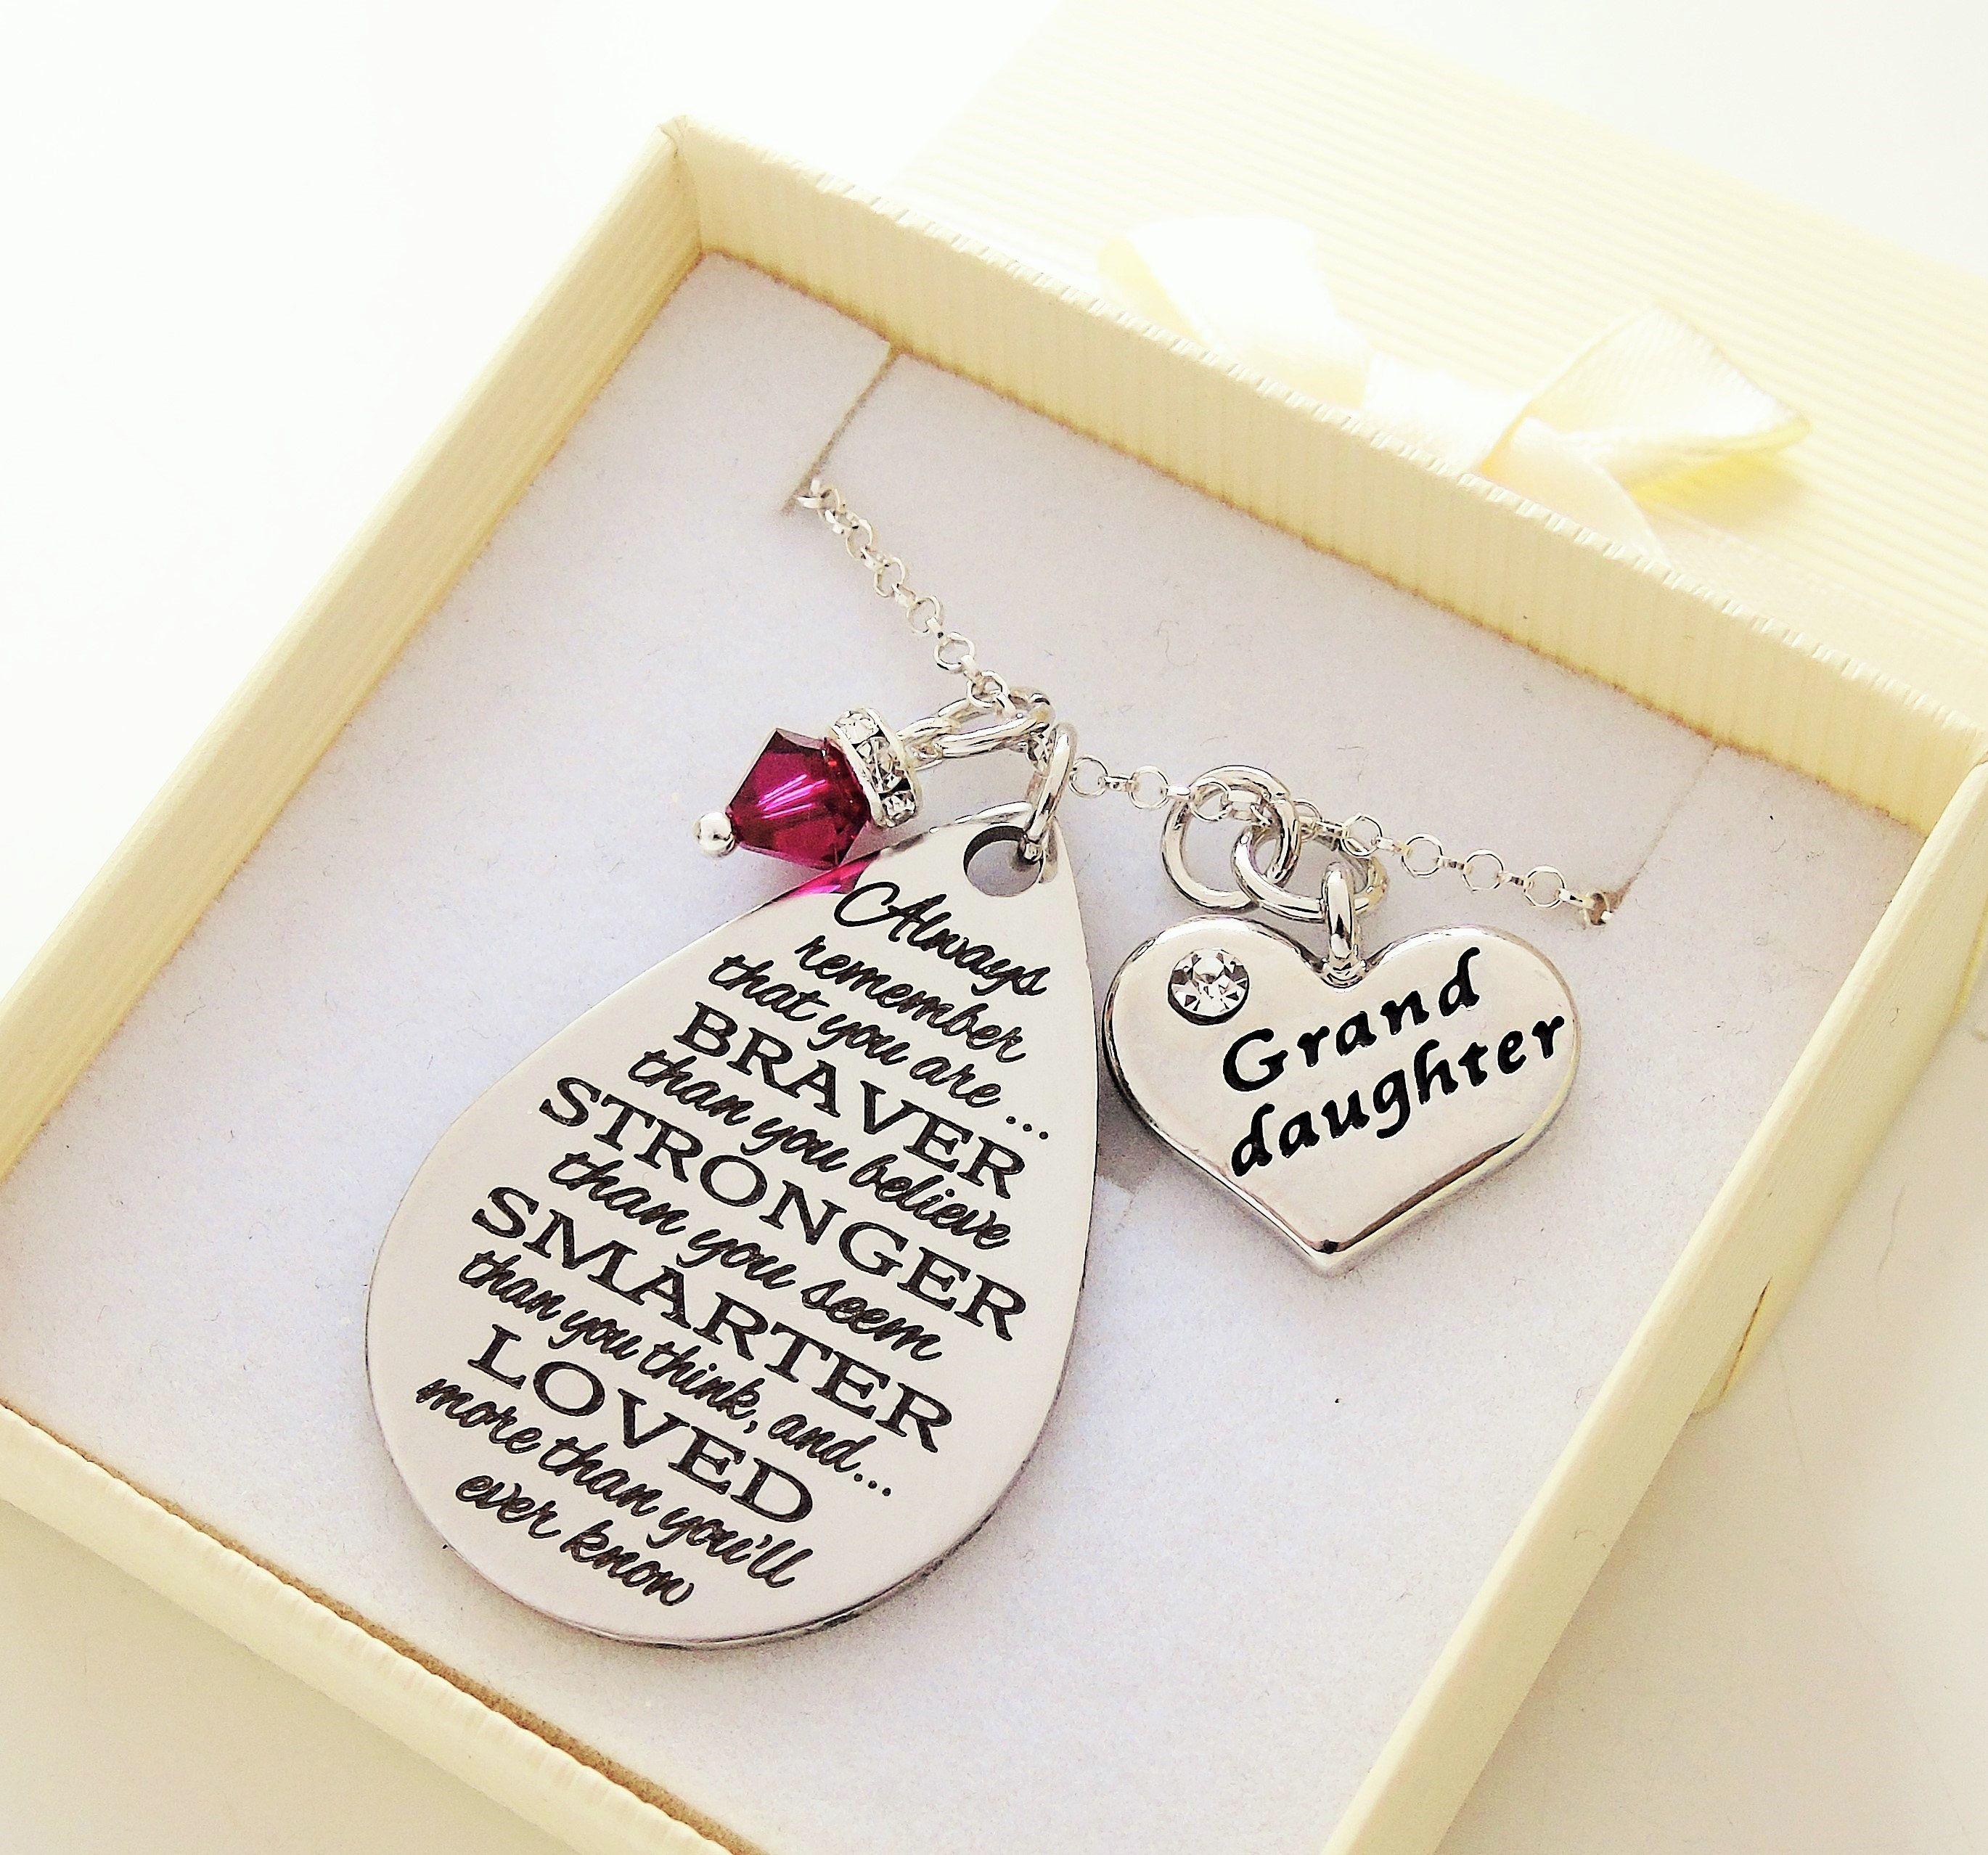 Granddaughter Gift Sterling Silver Swarovski Necklace For Birthday Christmas From Grandma Grandparents